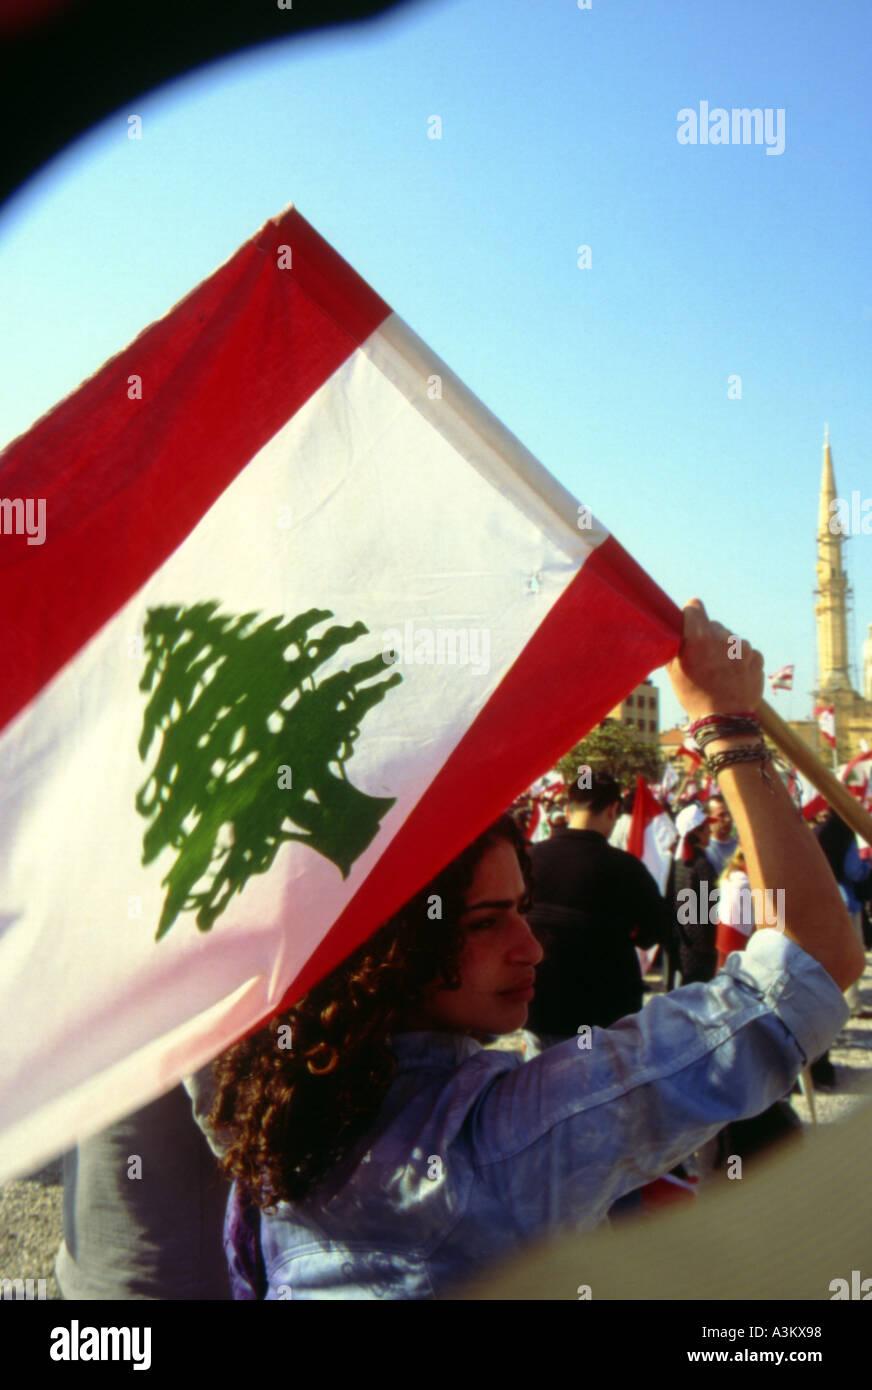 free from pain beirut lebanon Stock Photo